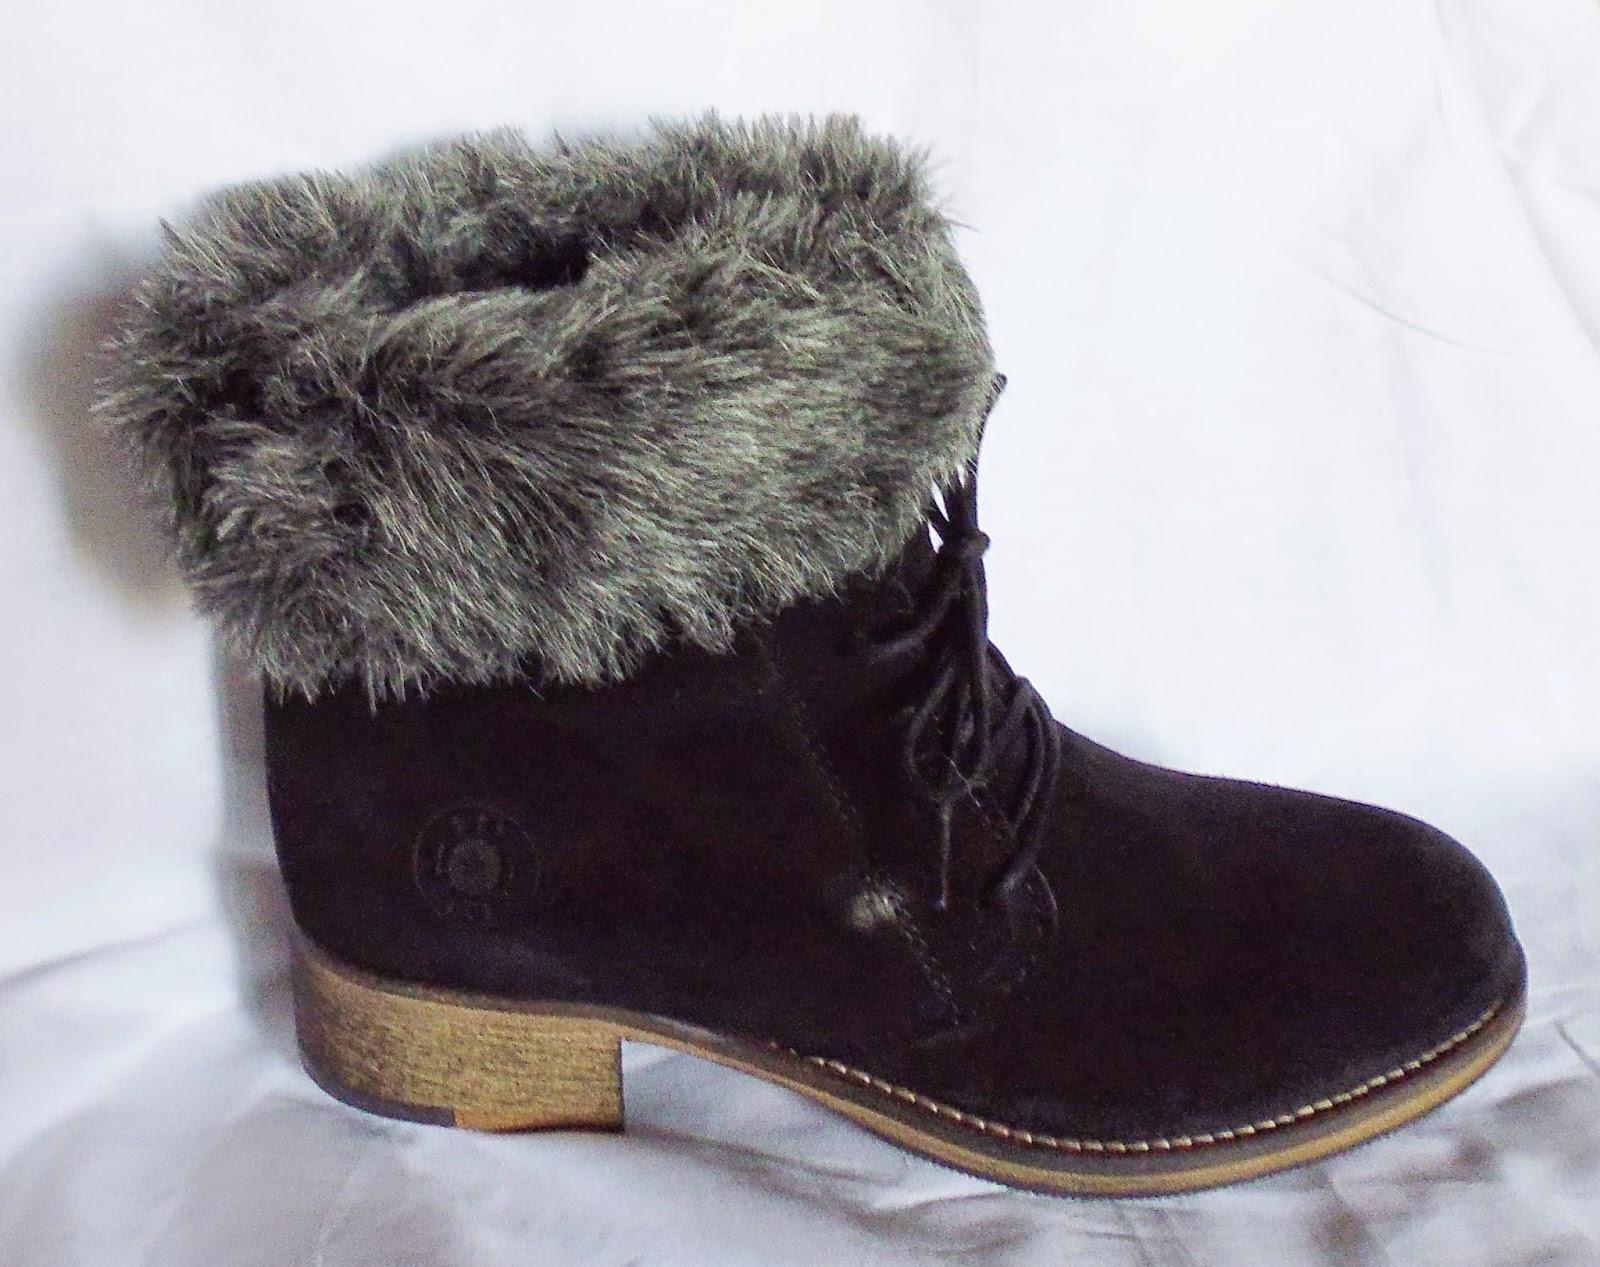 http://www.ebay.fr/itm/bottines-noires-fourrees-femme-CUIR-noir-chaudes-cuir-veritable-made-in-Portugal-/301256289360?ssPageName=STRK:MESE:IT